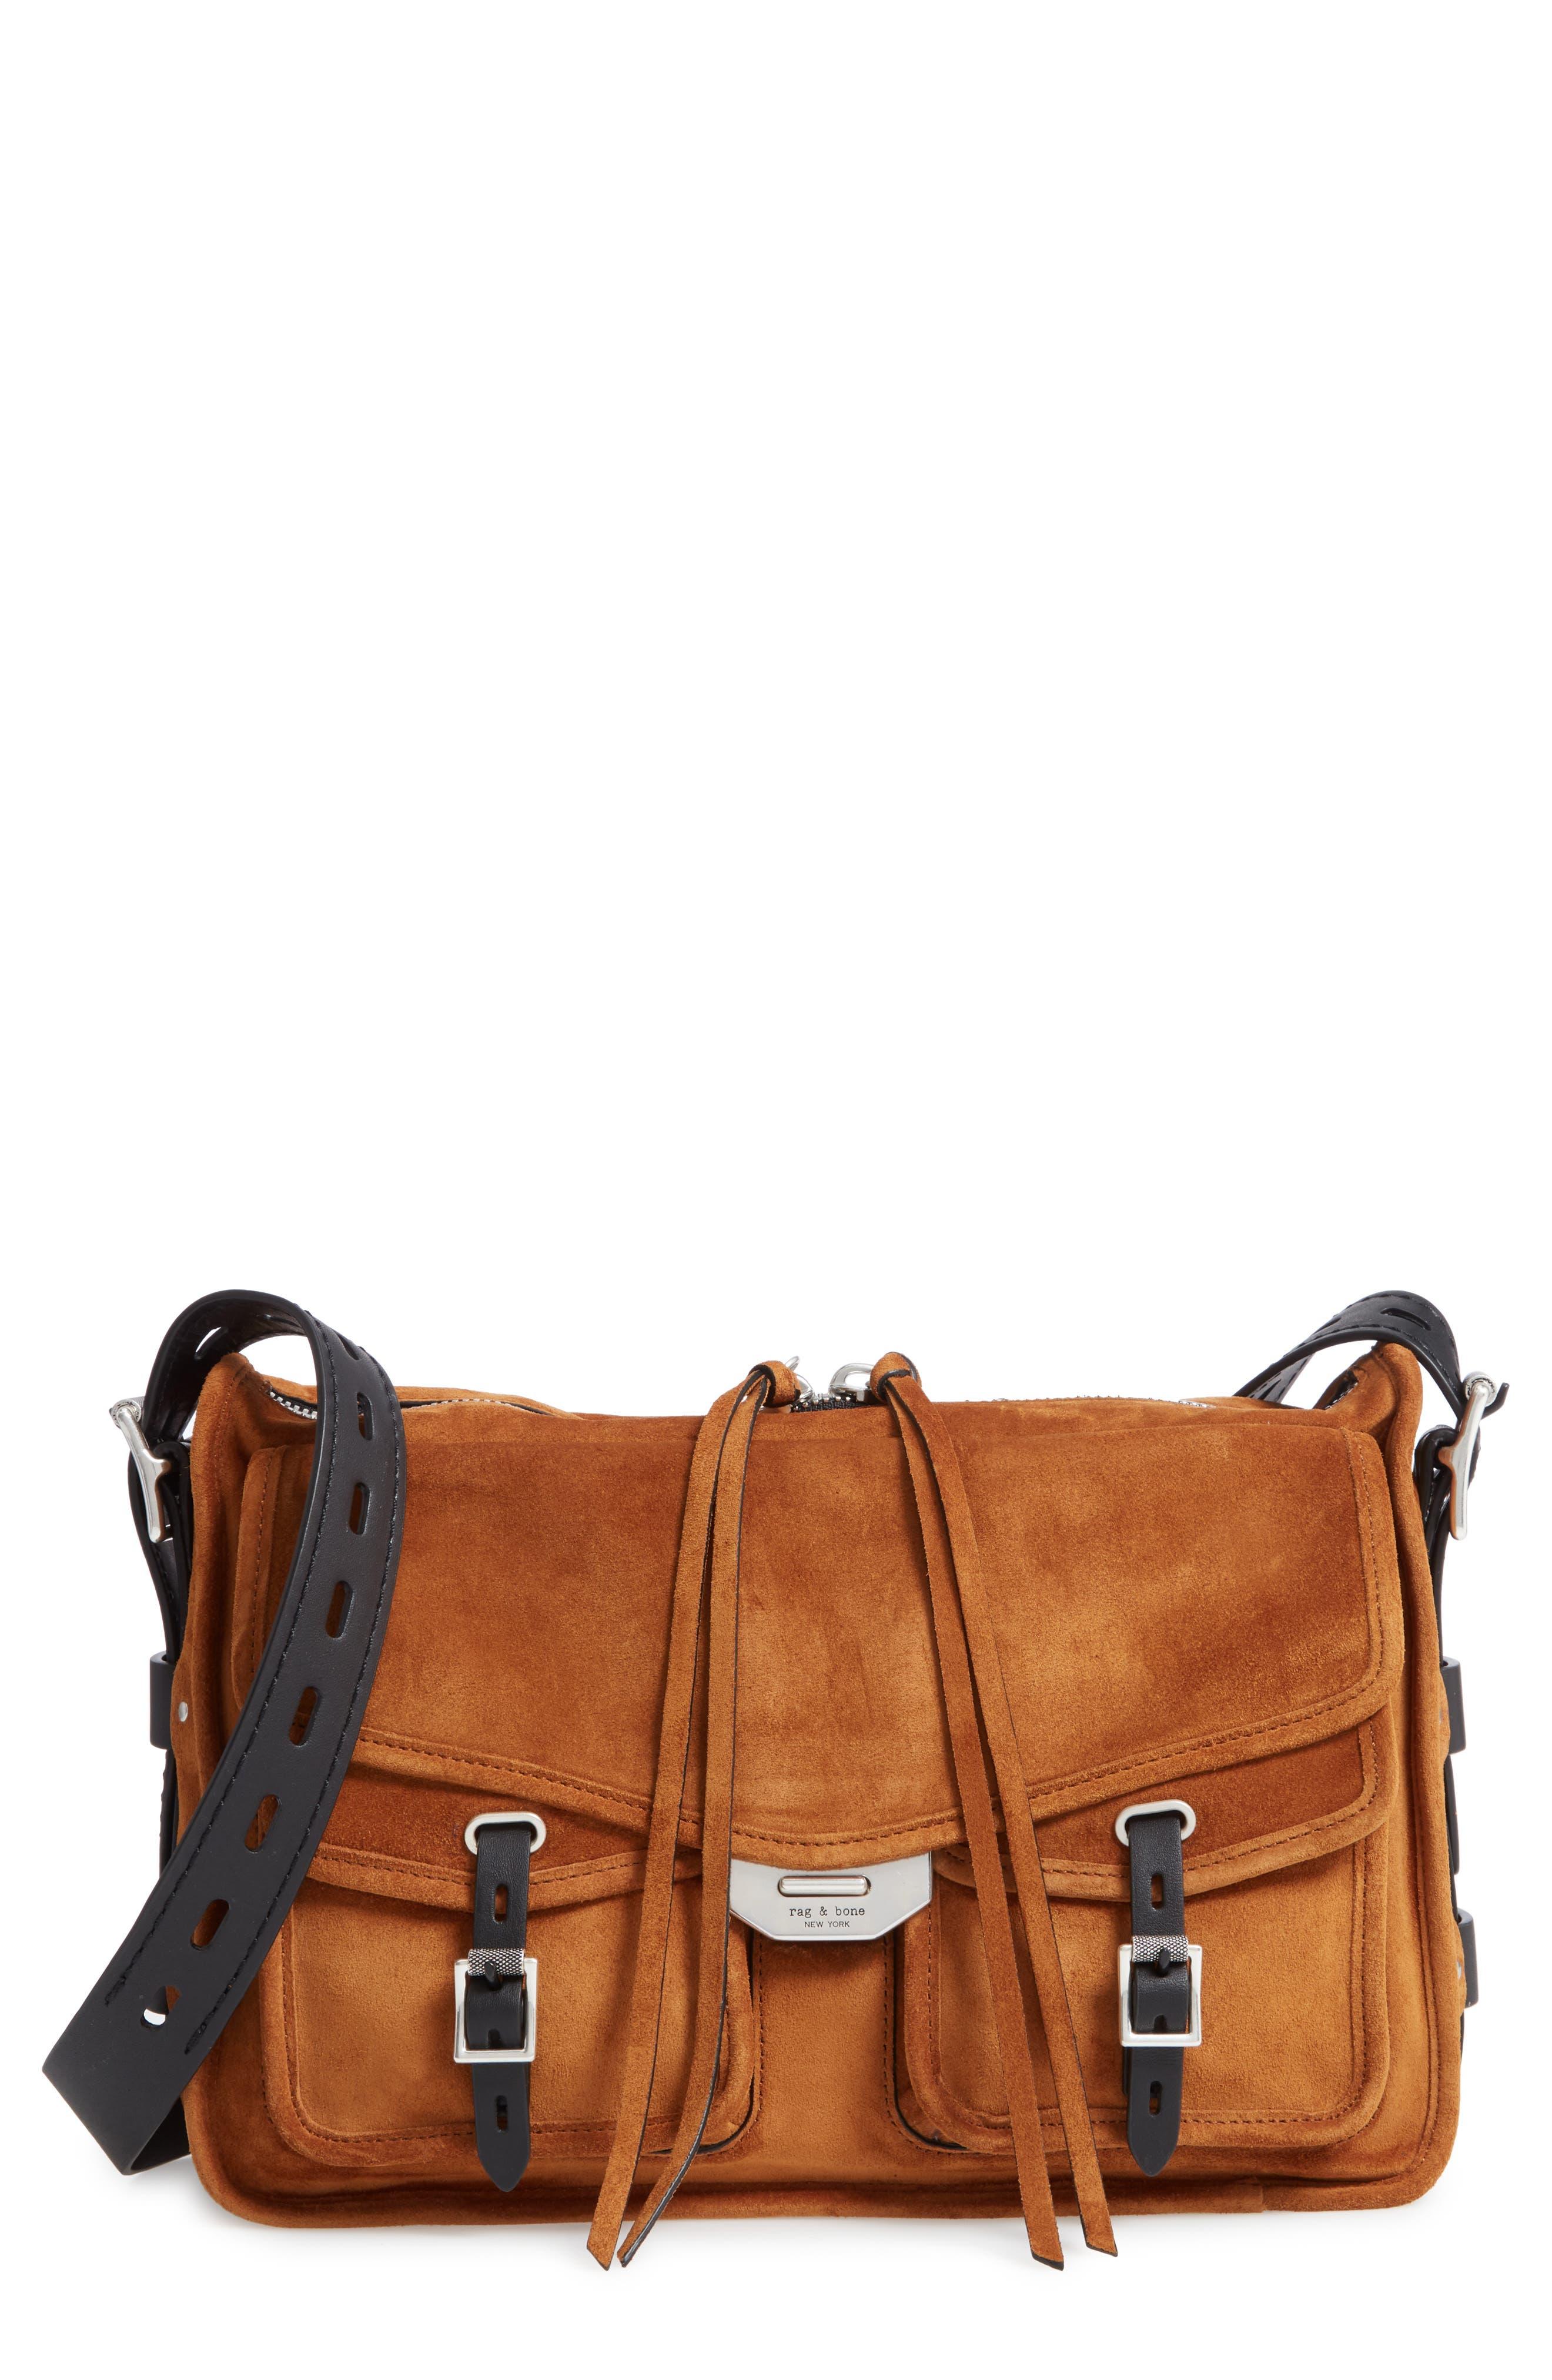 Field Leather Messenger Bag,                         Main,                         color, TAN SUEDE